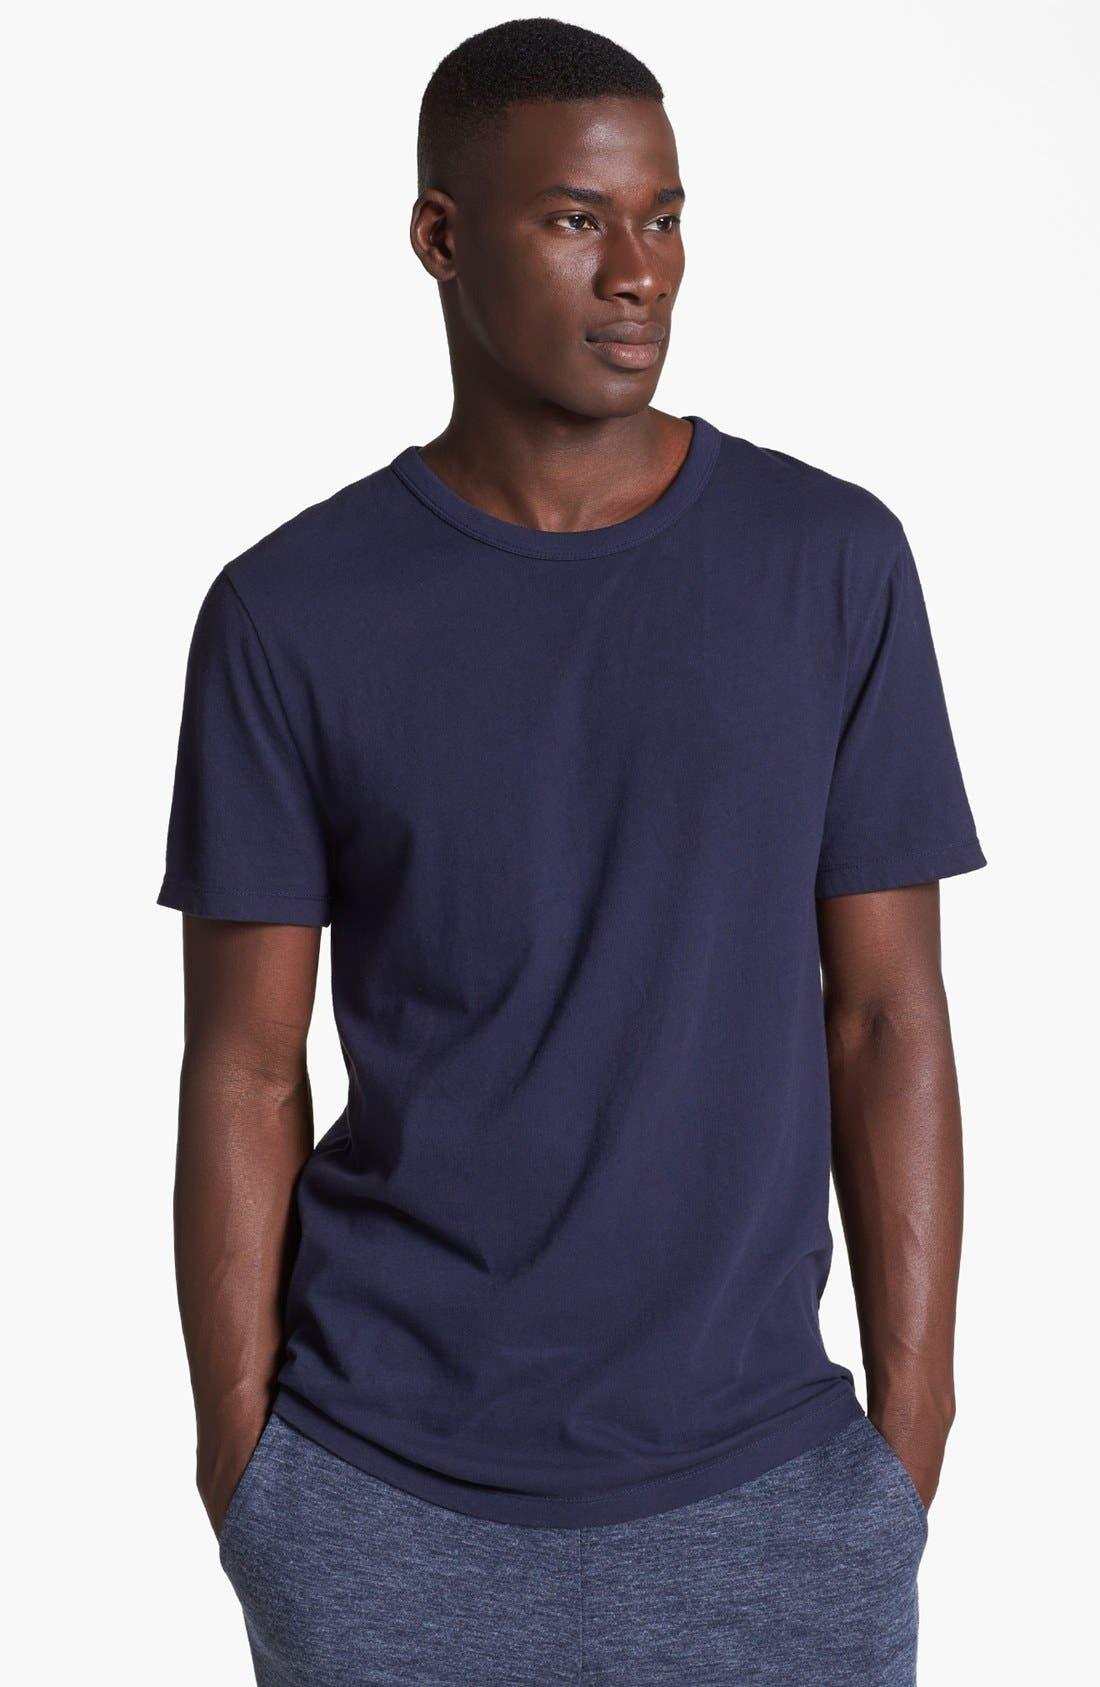 Alternate Image 1 Selected - T by Alexander Wang Classic Crewneck T-Shirt